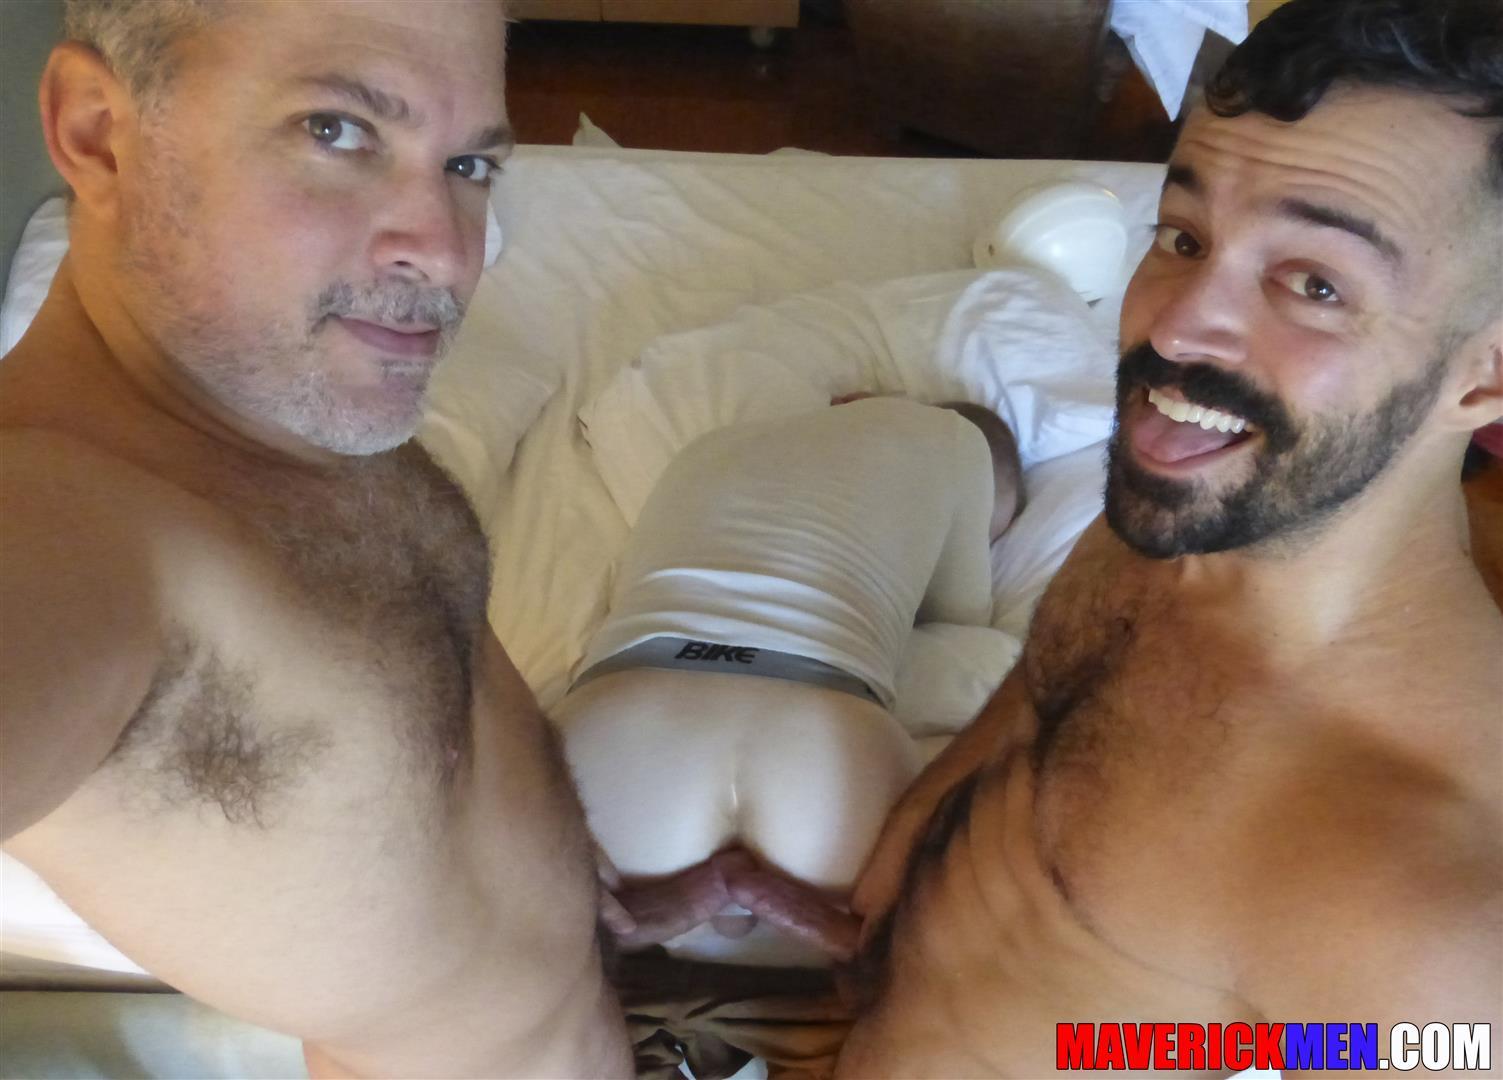 The-Maverick-Men-Erik-Naked-Blue-Collar-Guy-Getting-Barebacked-Hairy-Ass-Amateur-Gay-Porn-5 Young Blue Collar Guy Gets Barebacked By Two Muscle Daddies